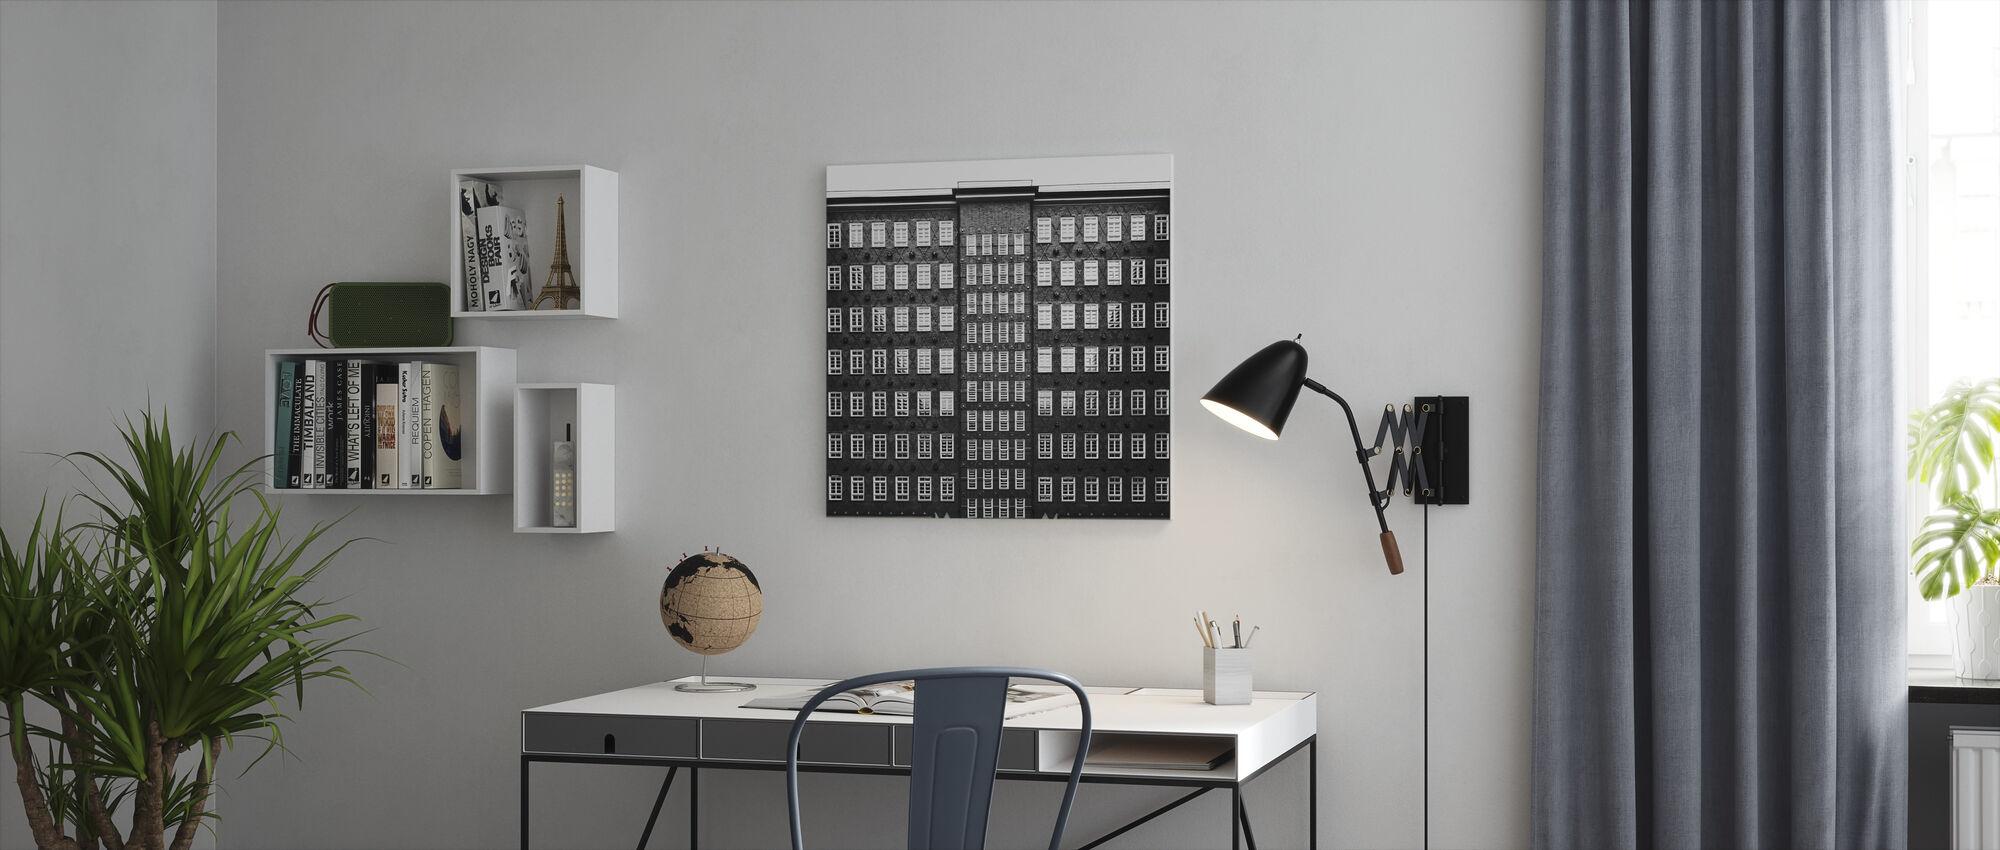 Kontorhaus Quarter - Hamburg - Canvas print - Office